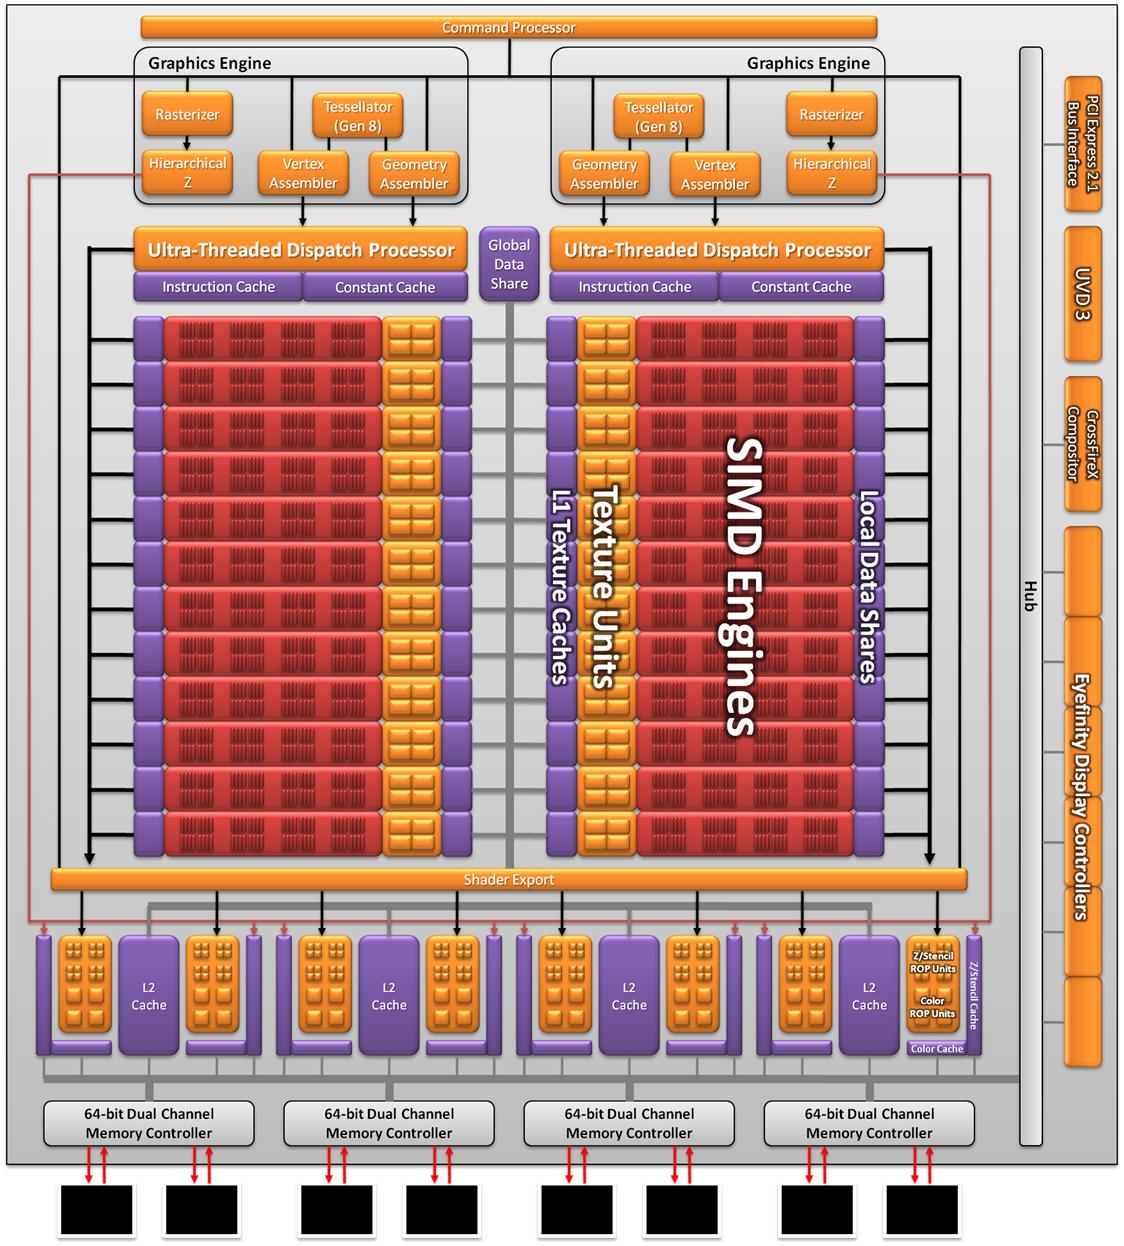 Cayman: The Last 32nm Castaway - AMD's Radeon HD 6970 & Radeon HD